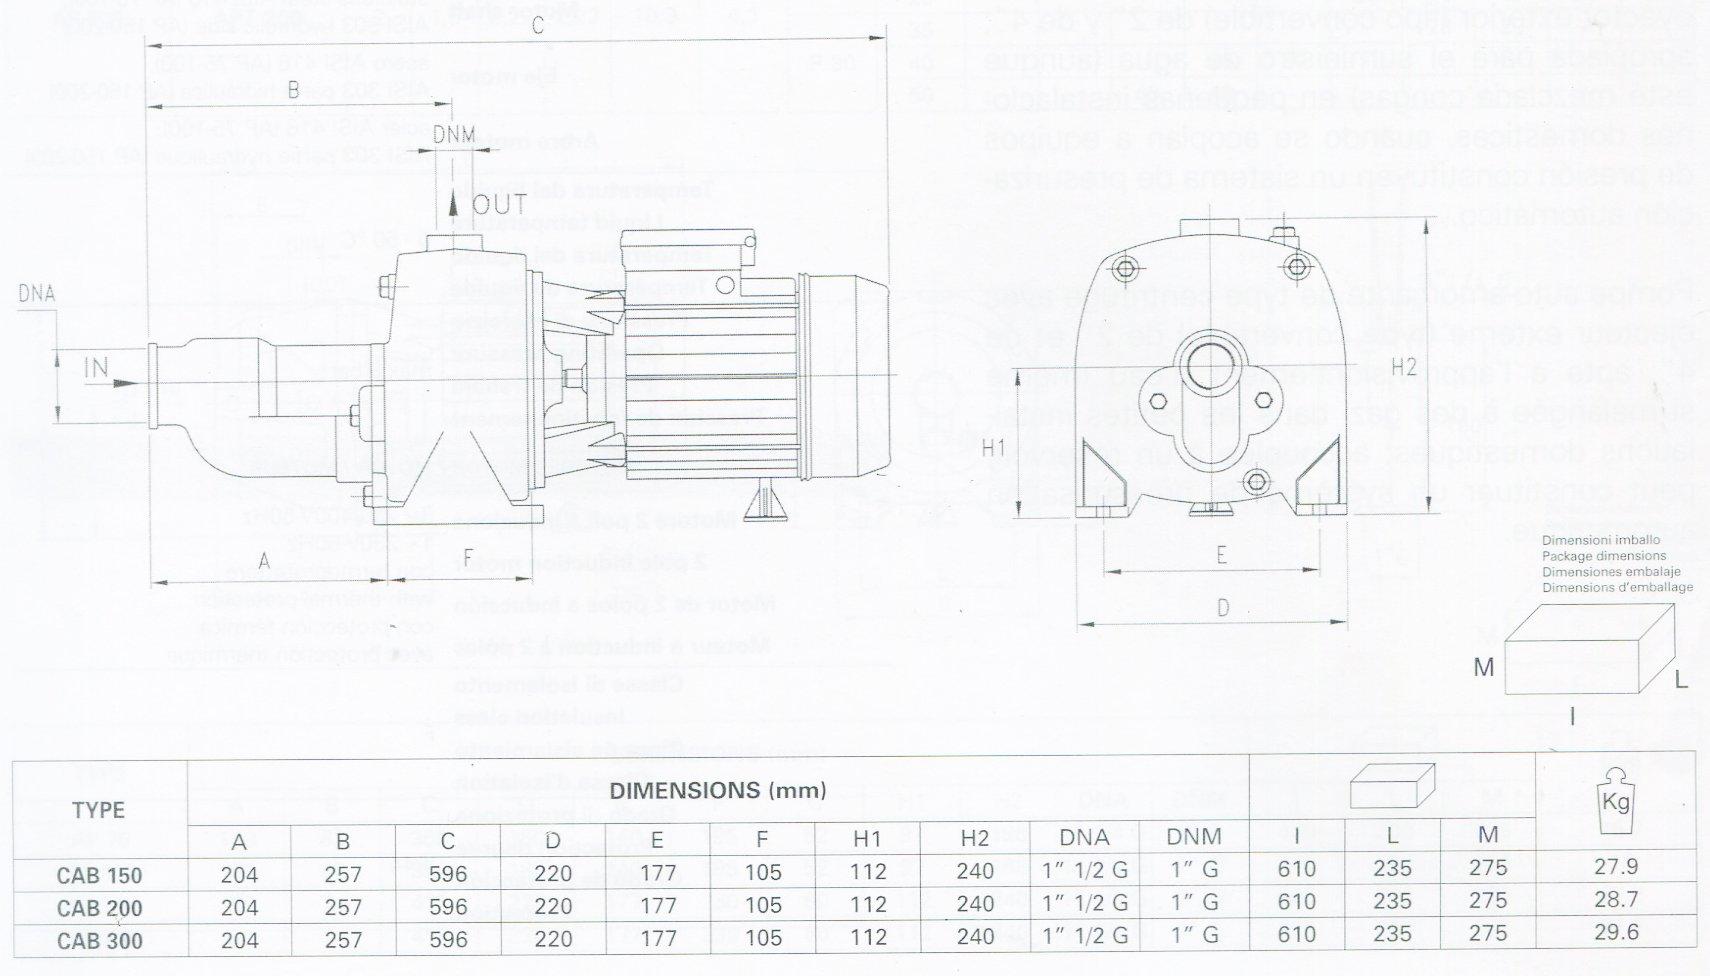 https://maybompentax.com.vn/images/2013/01/May-bom-pentax-trang13-duong-dac-tinh-02.jpg